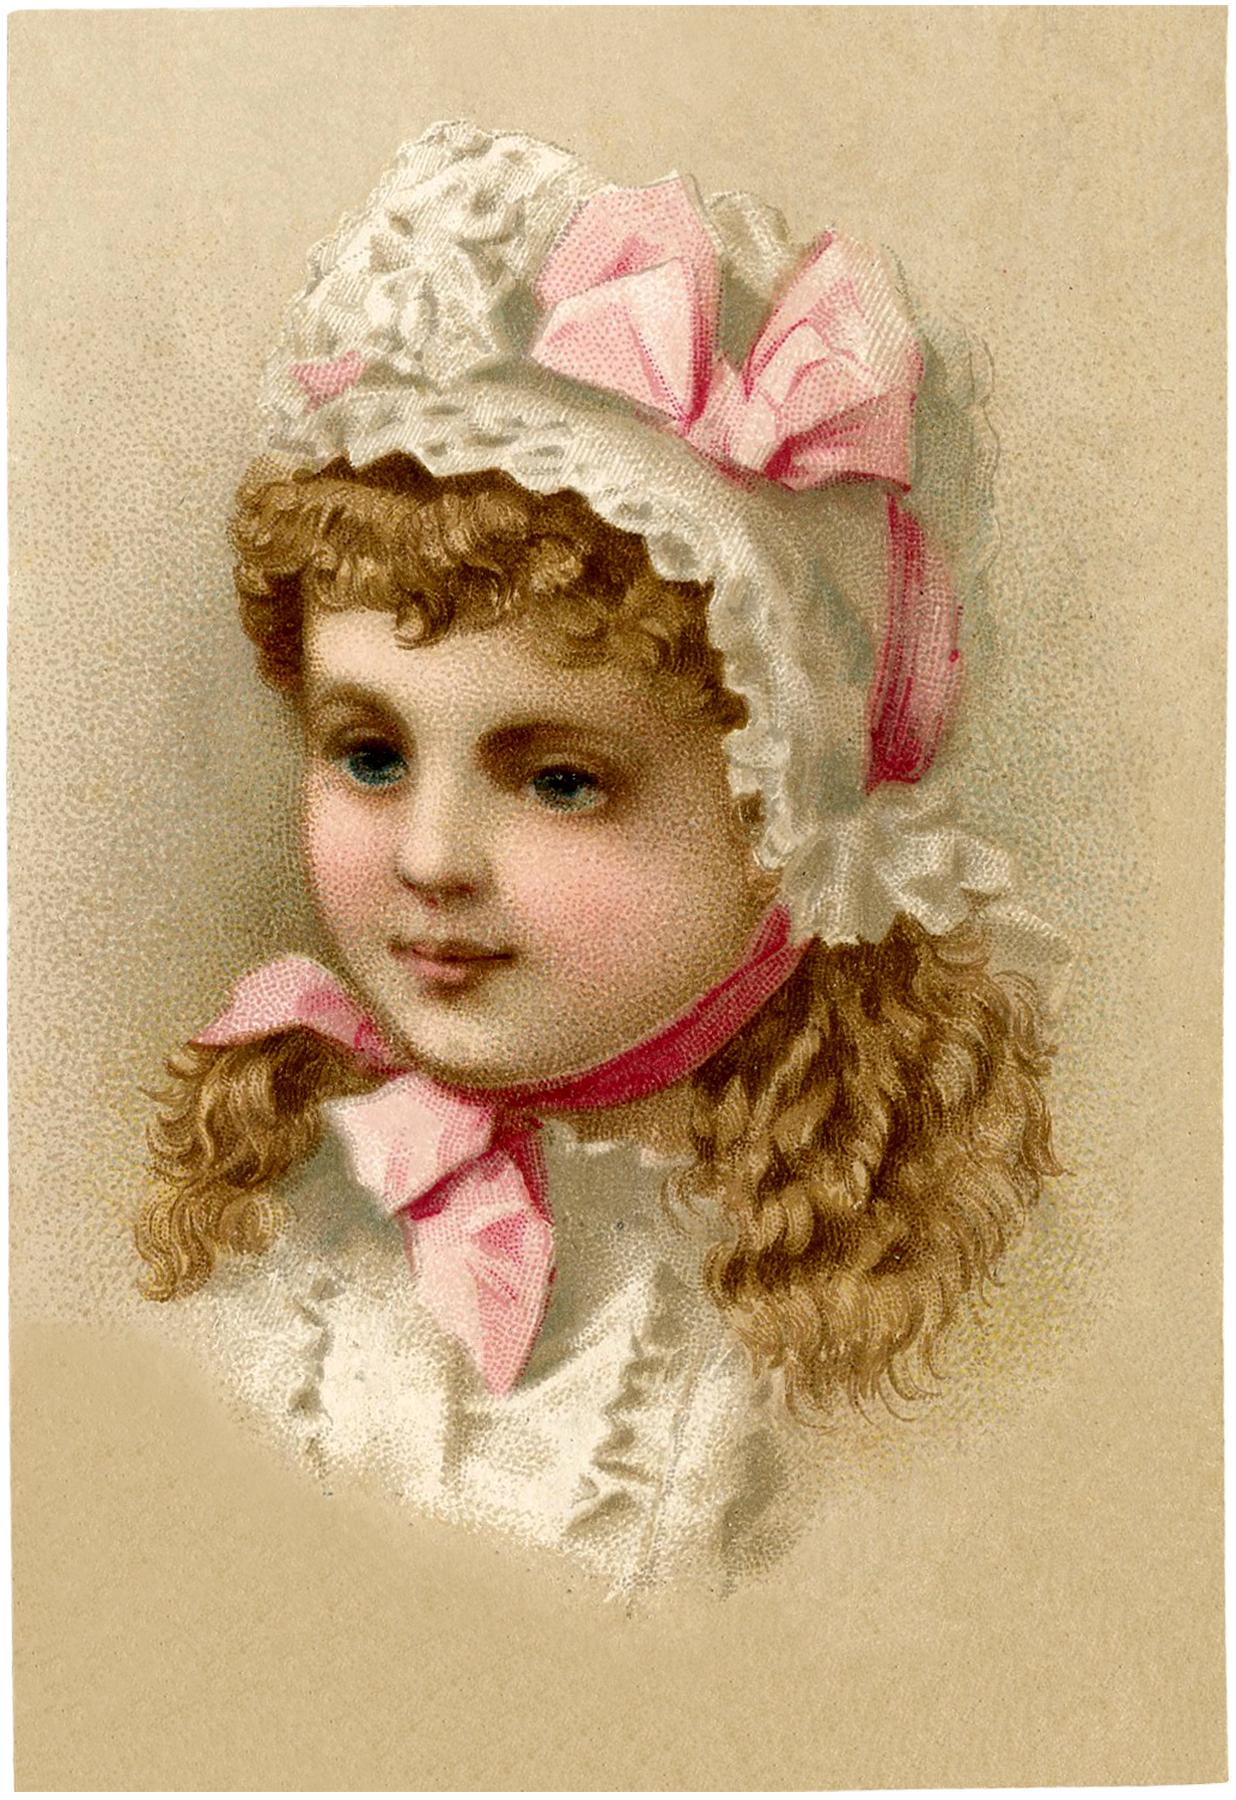 Vintage Girl with Bonnet Image